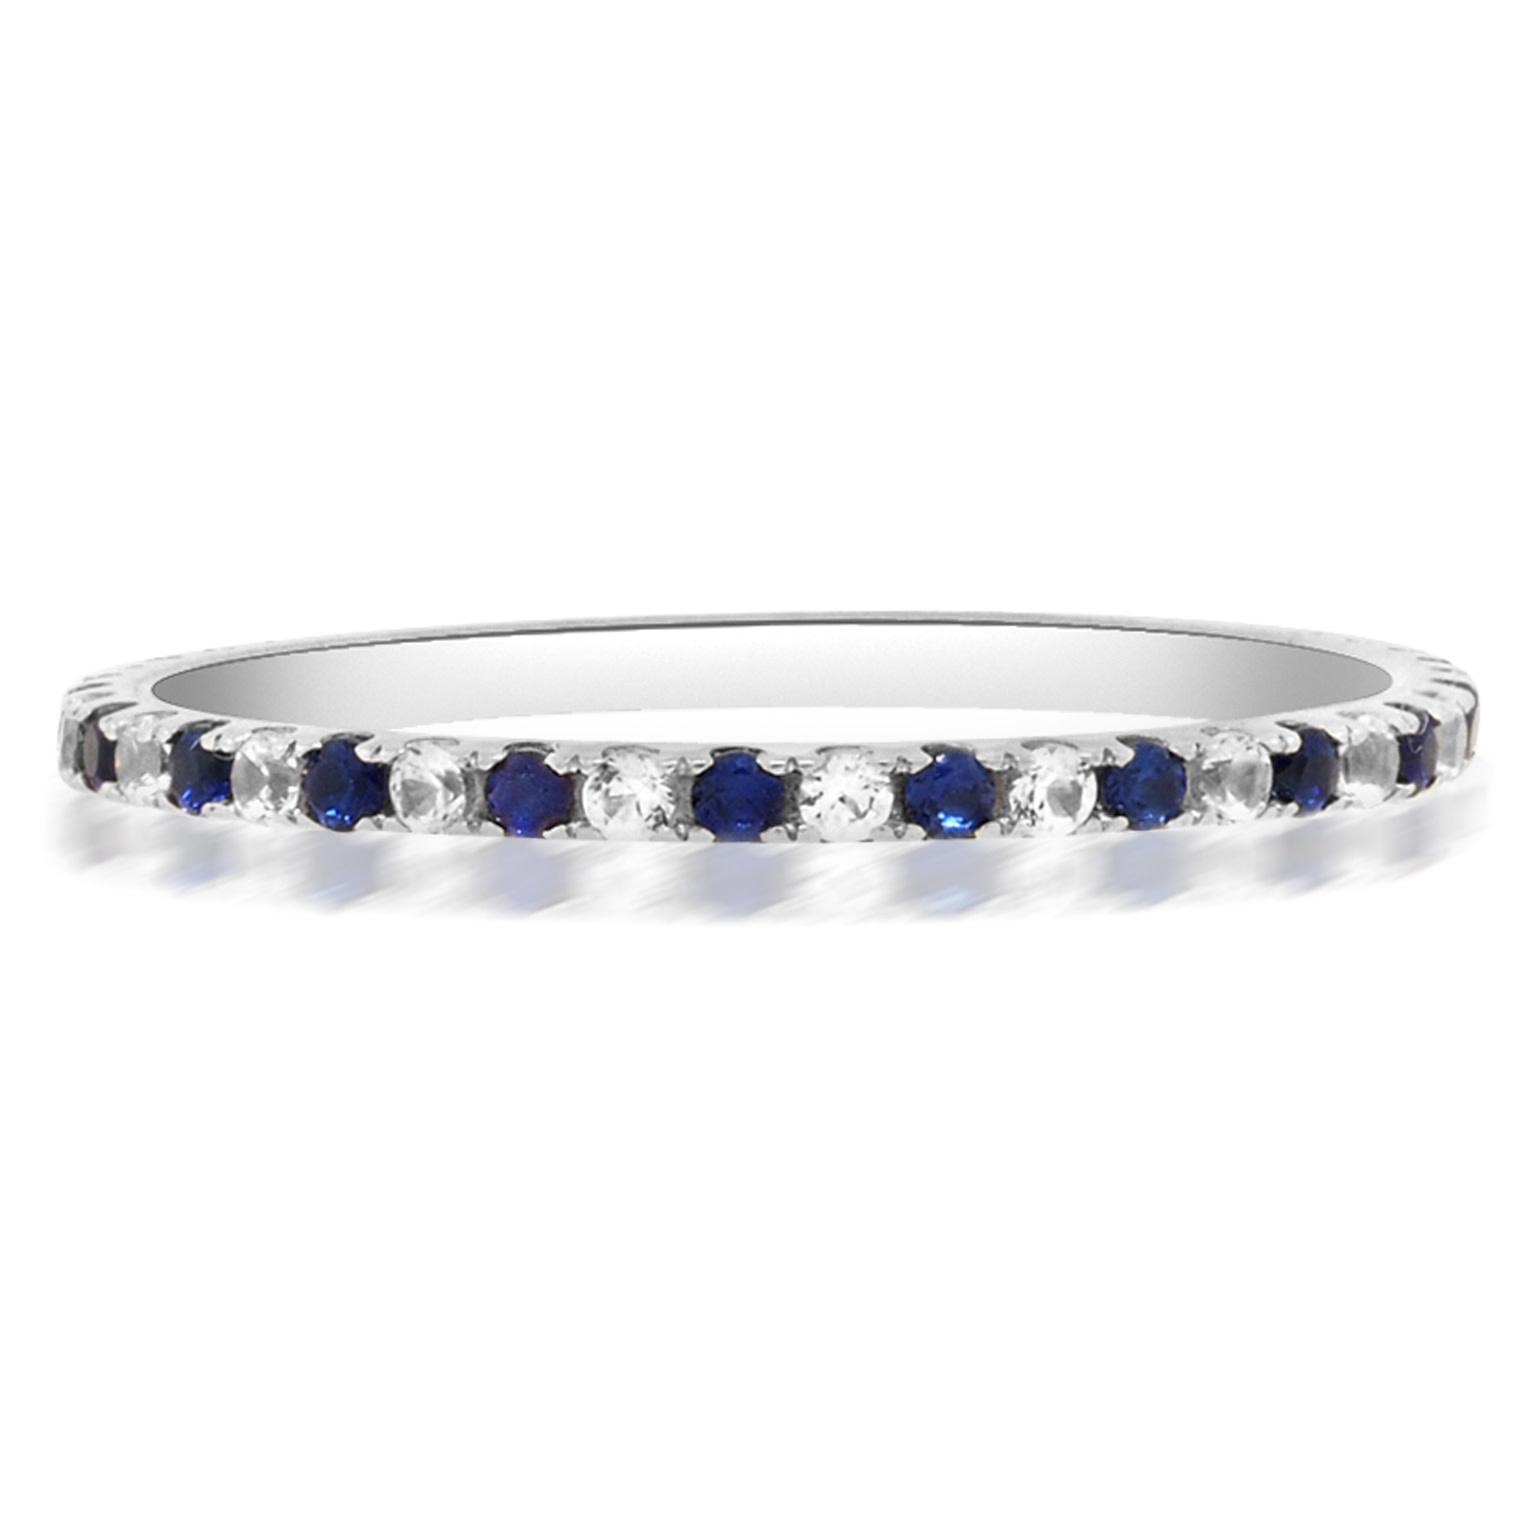 Trabert Goldsmiths Delicate Sapphire and Diamond Eternity Band